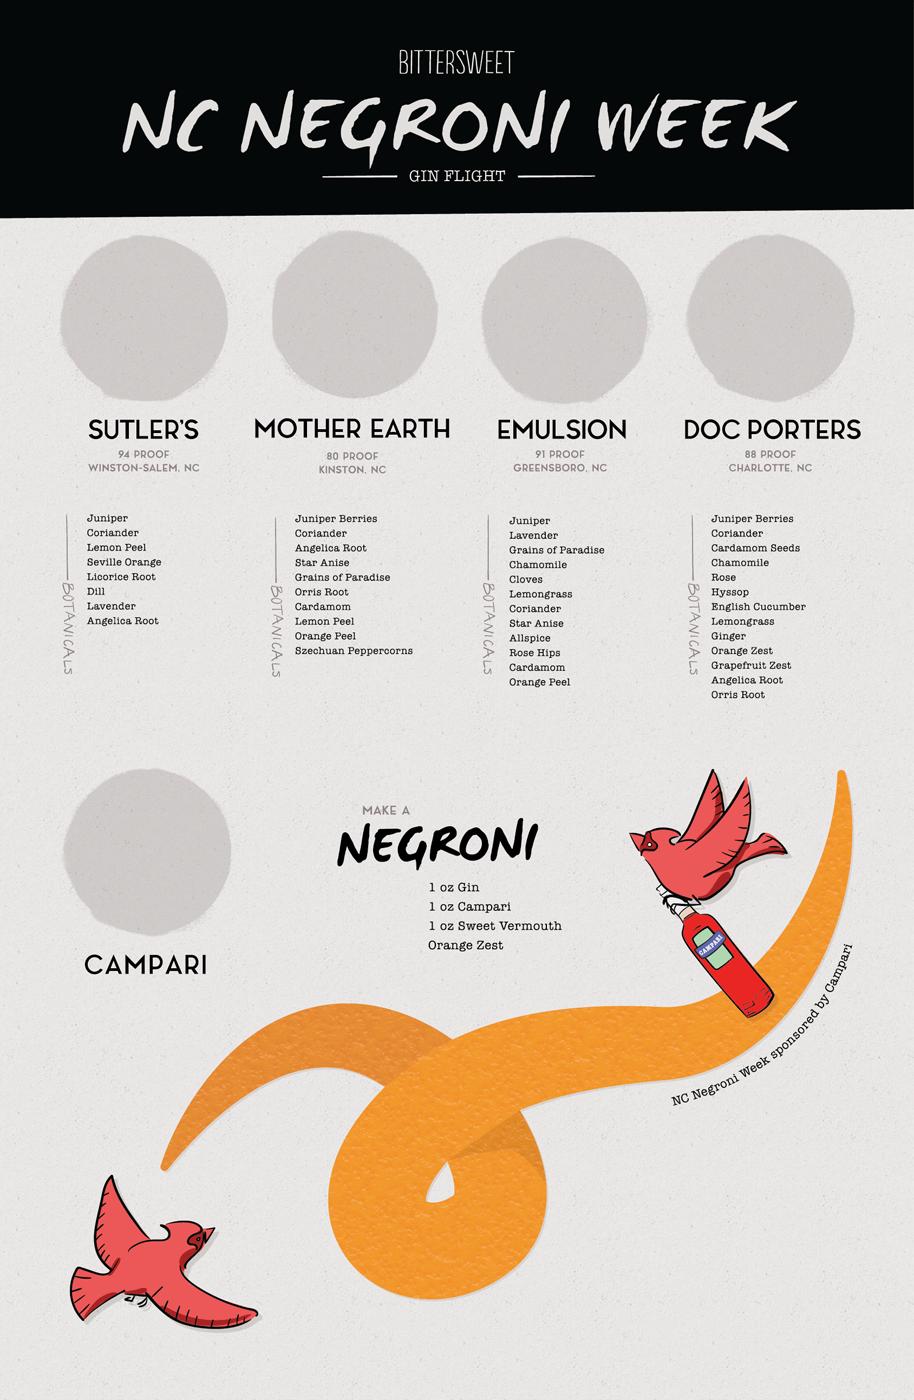 gin-flight-board-negroni.png